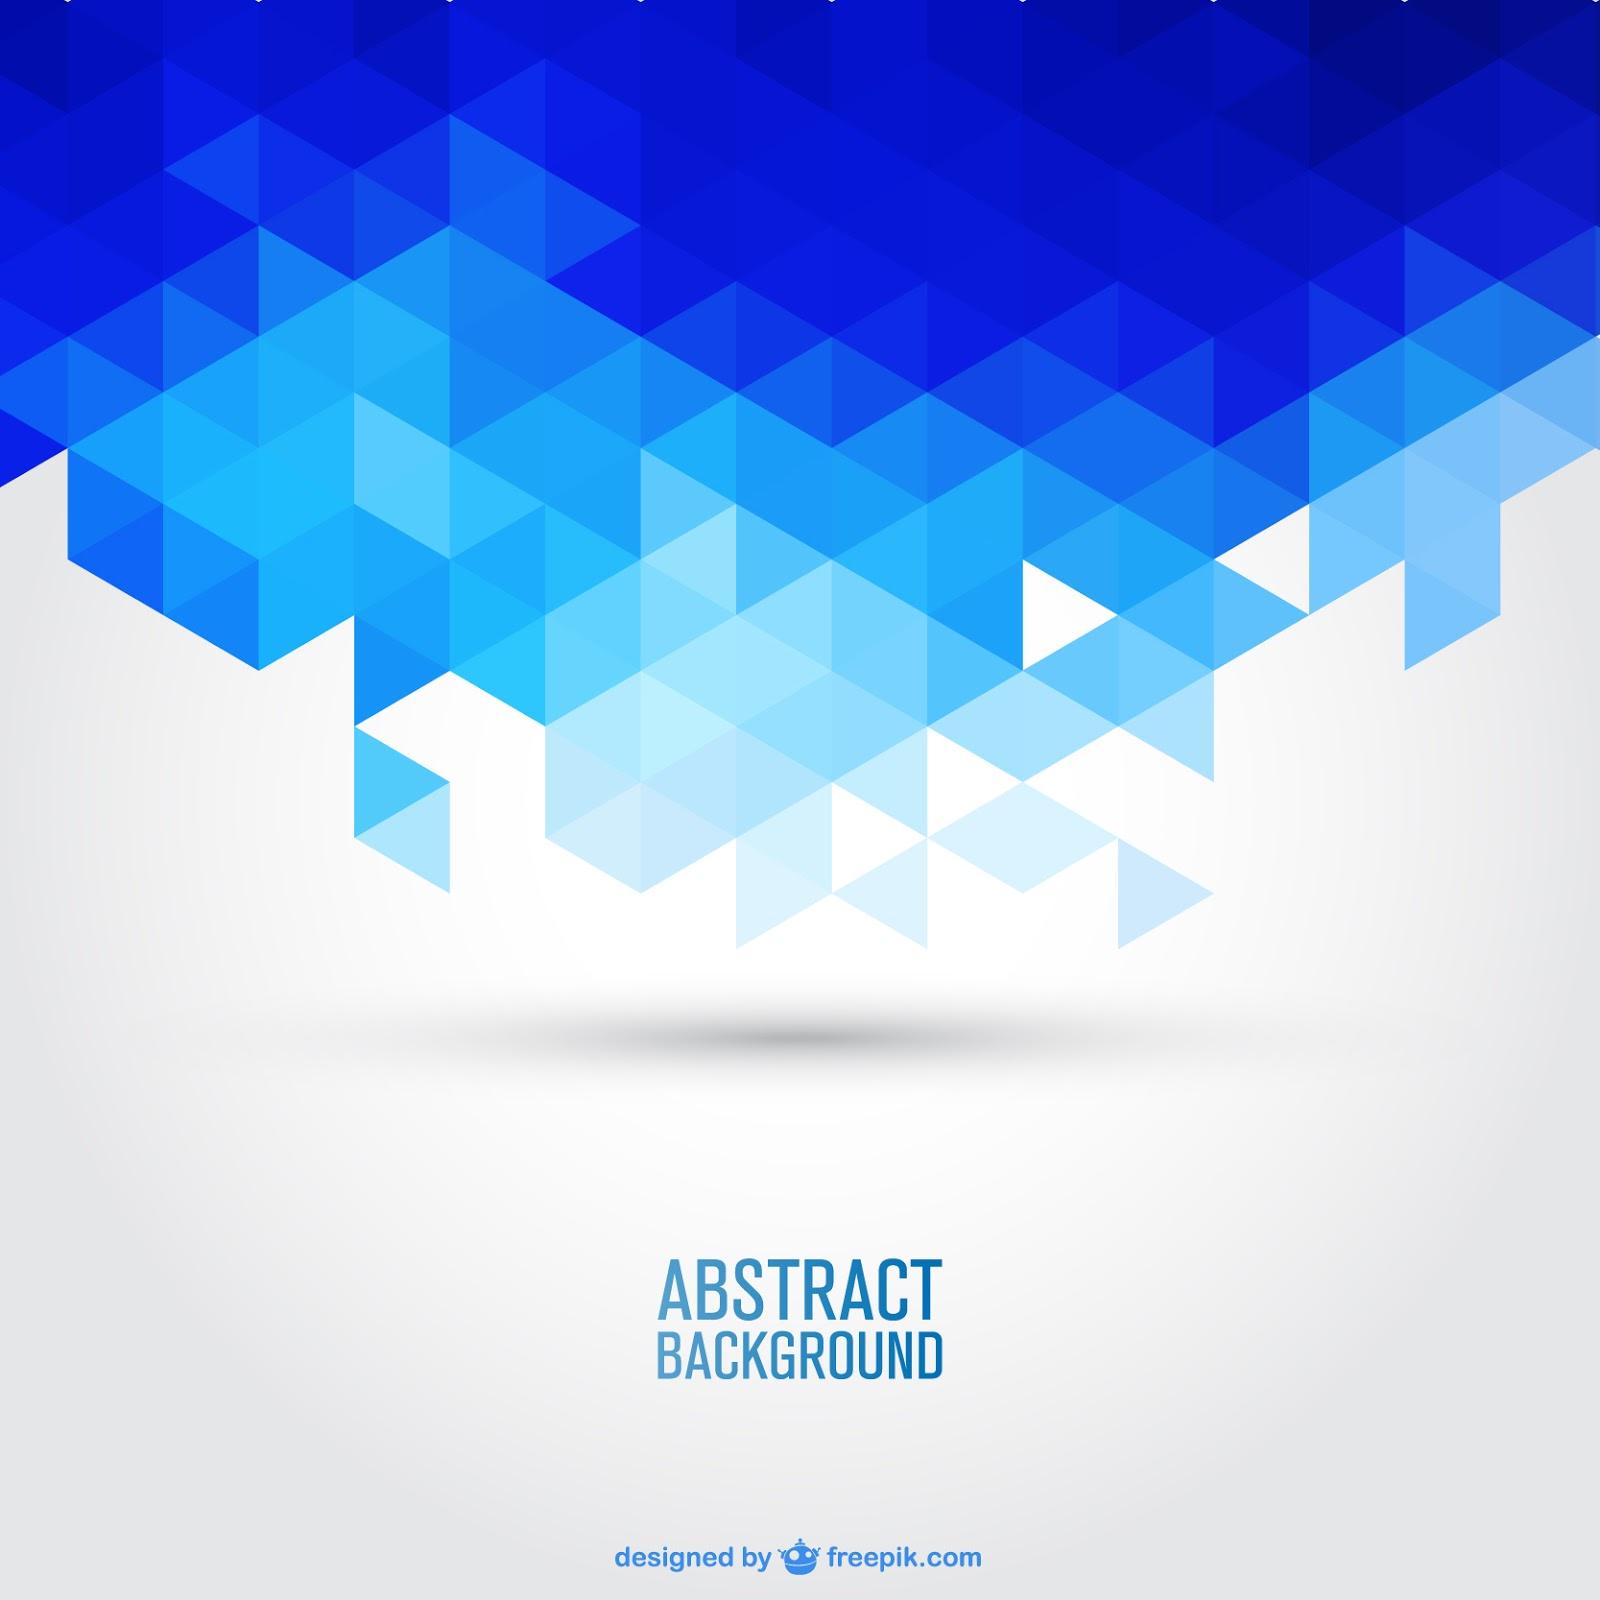 Free Download Hd Wallpapers Nail Art Designs Hd Wallpapers: 5 خلفيات رائعة في ملف مفتوحة بصيغة الاليستريتور AI